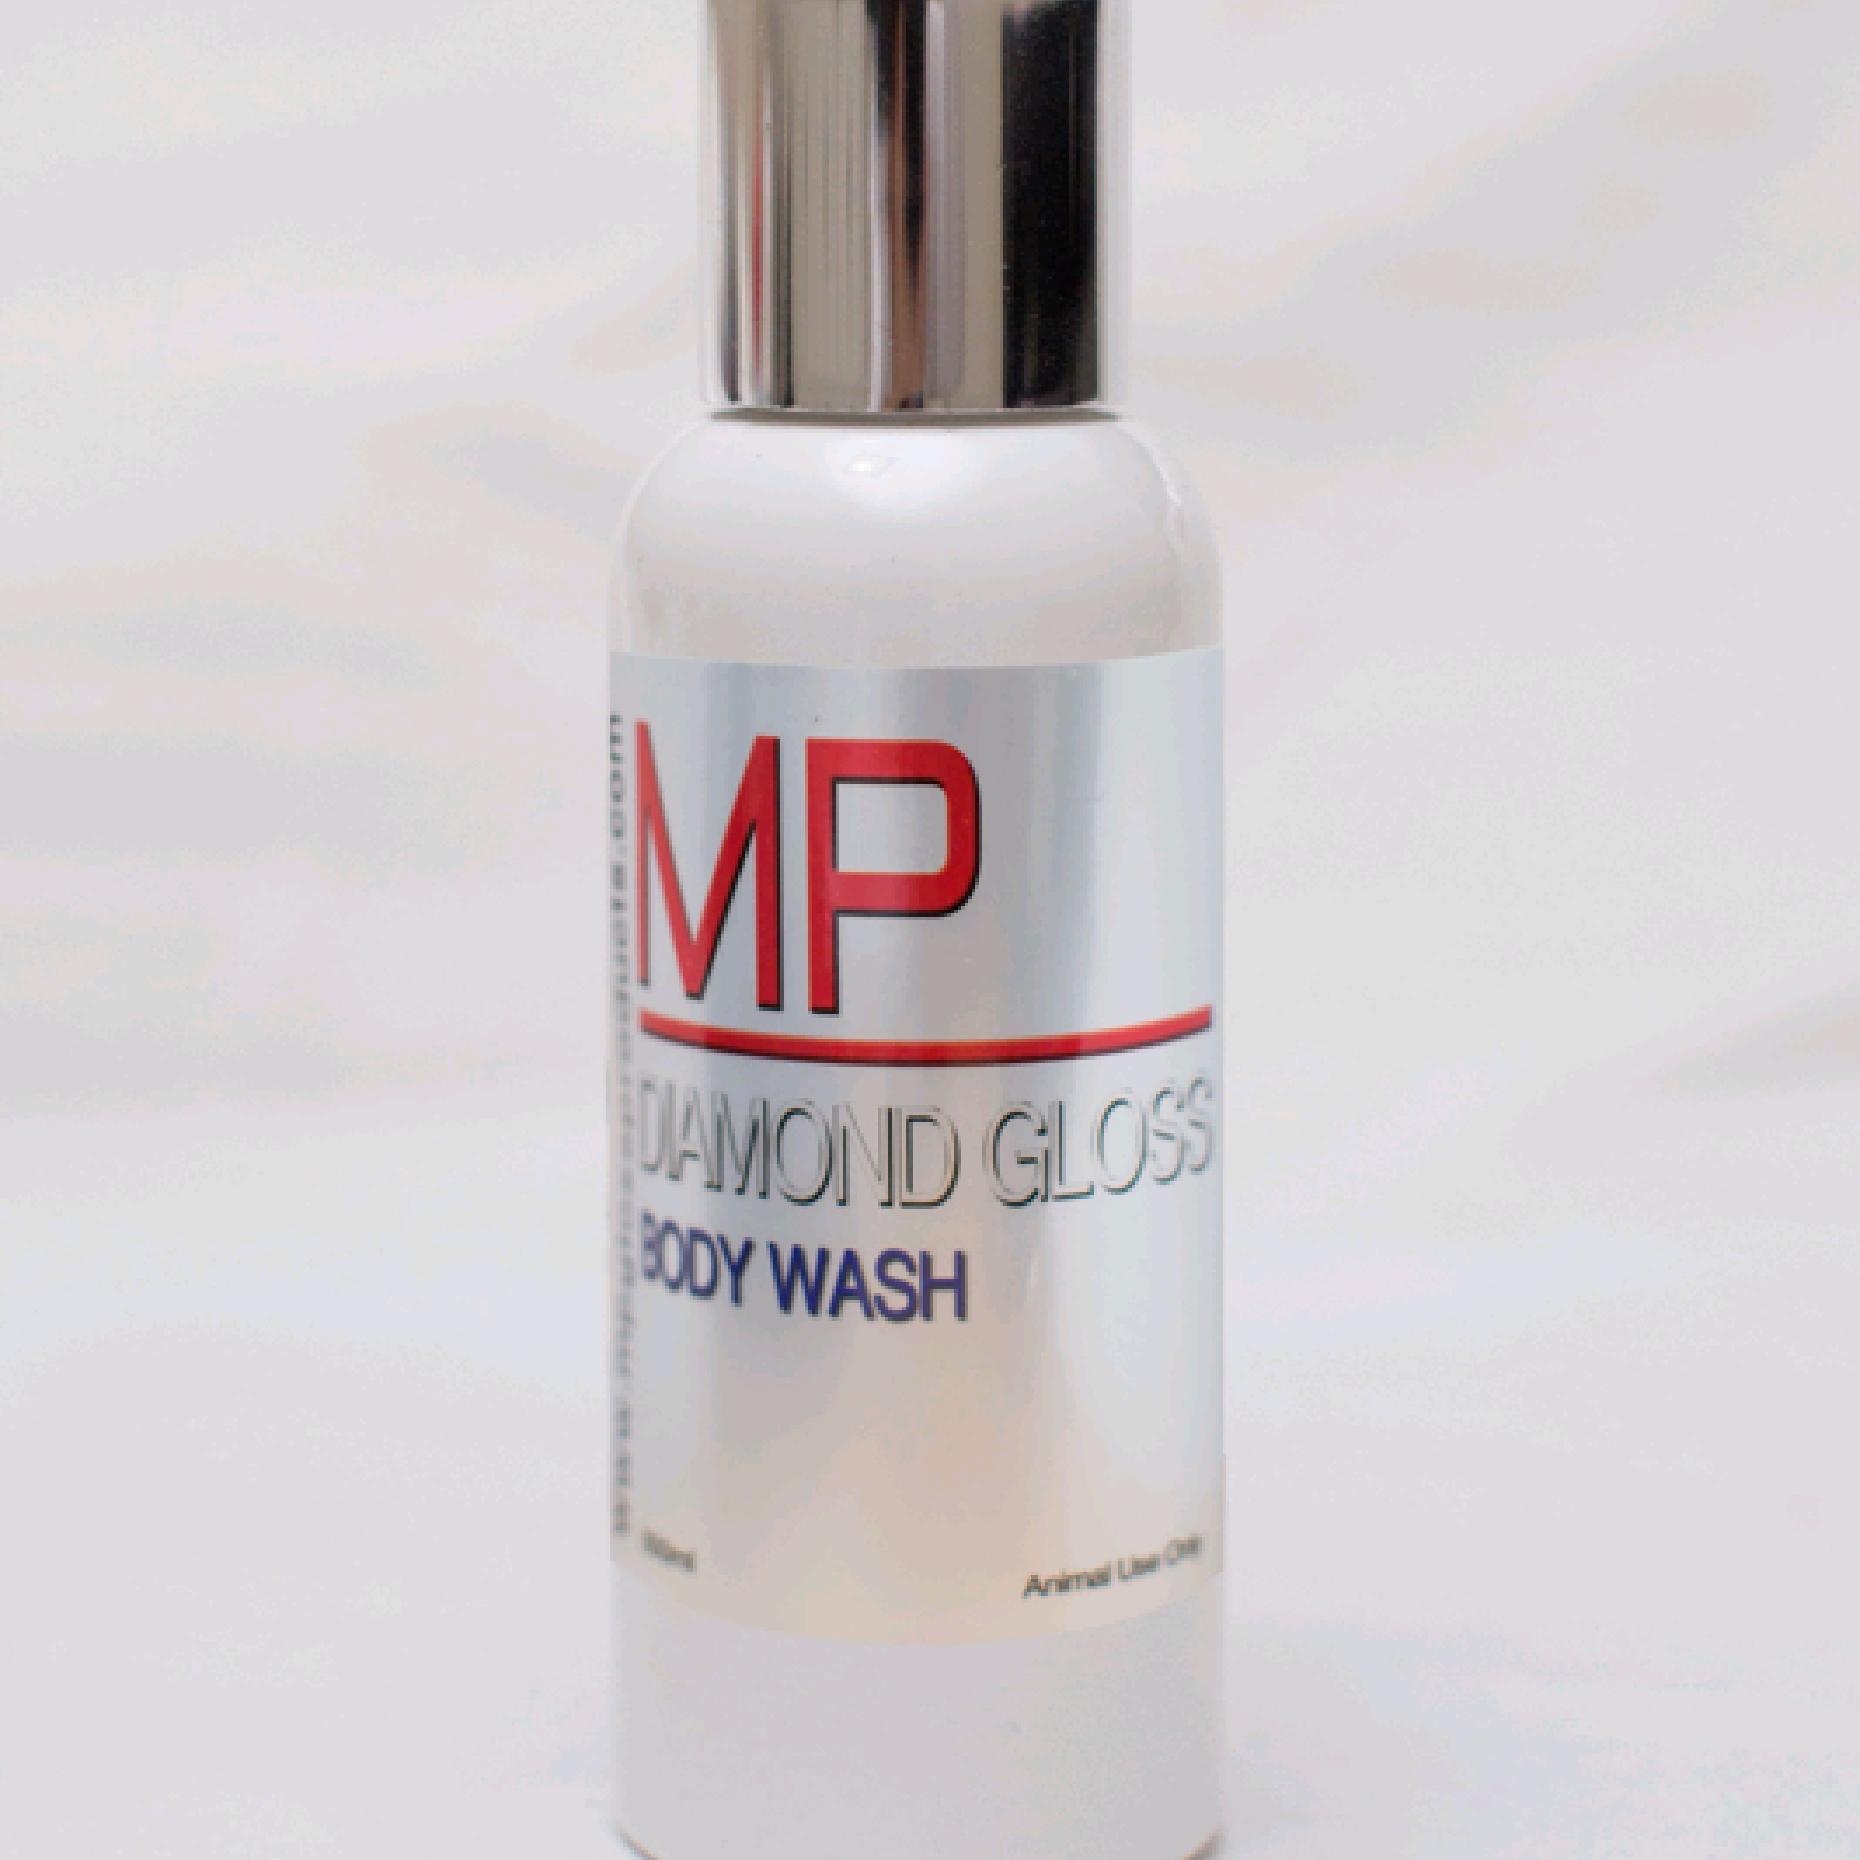 MP Diamond Gloss Body Wash